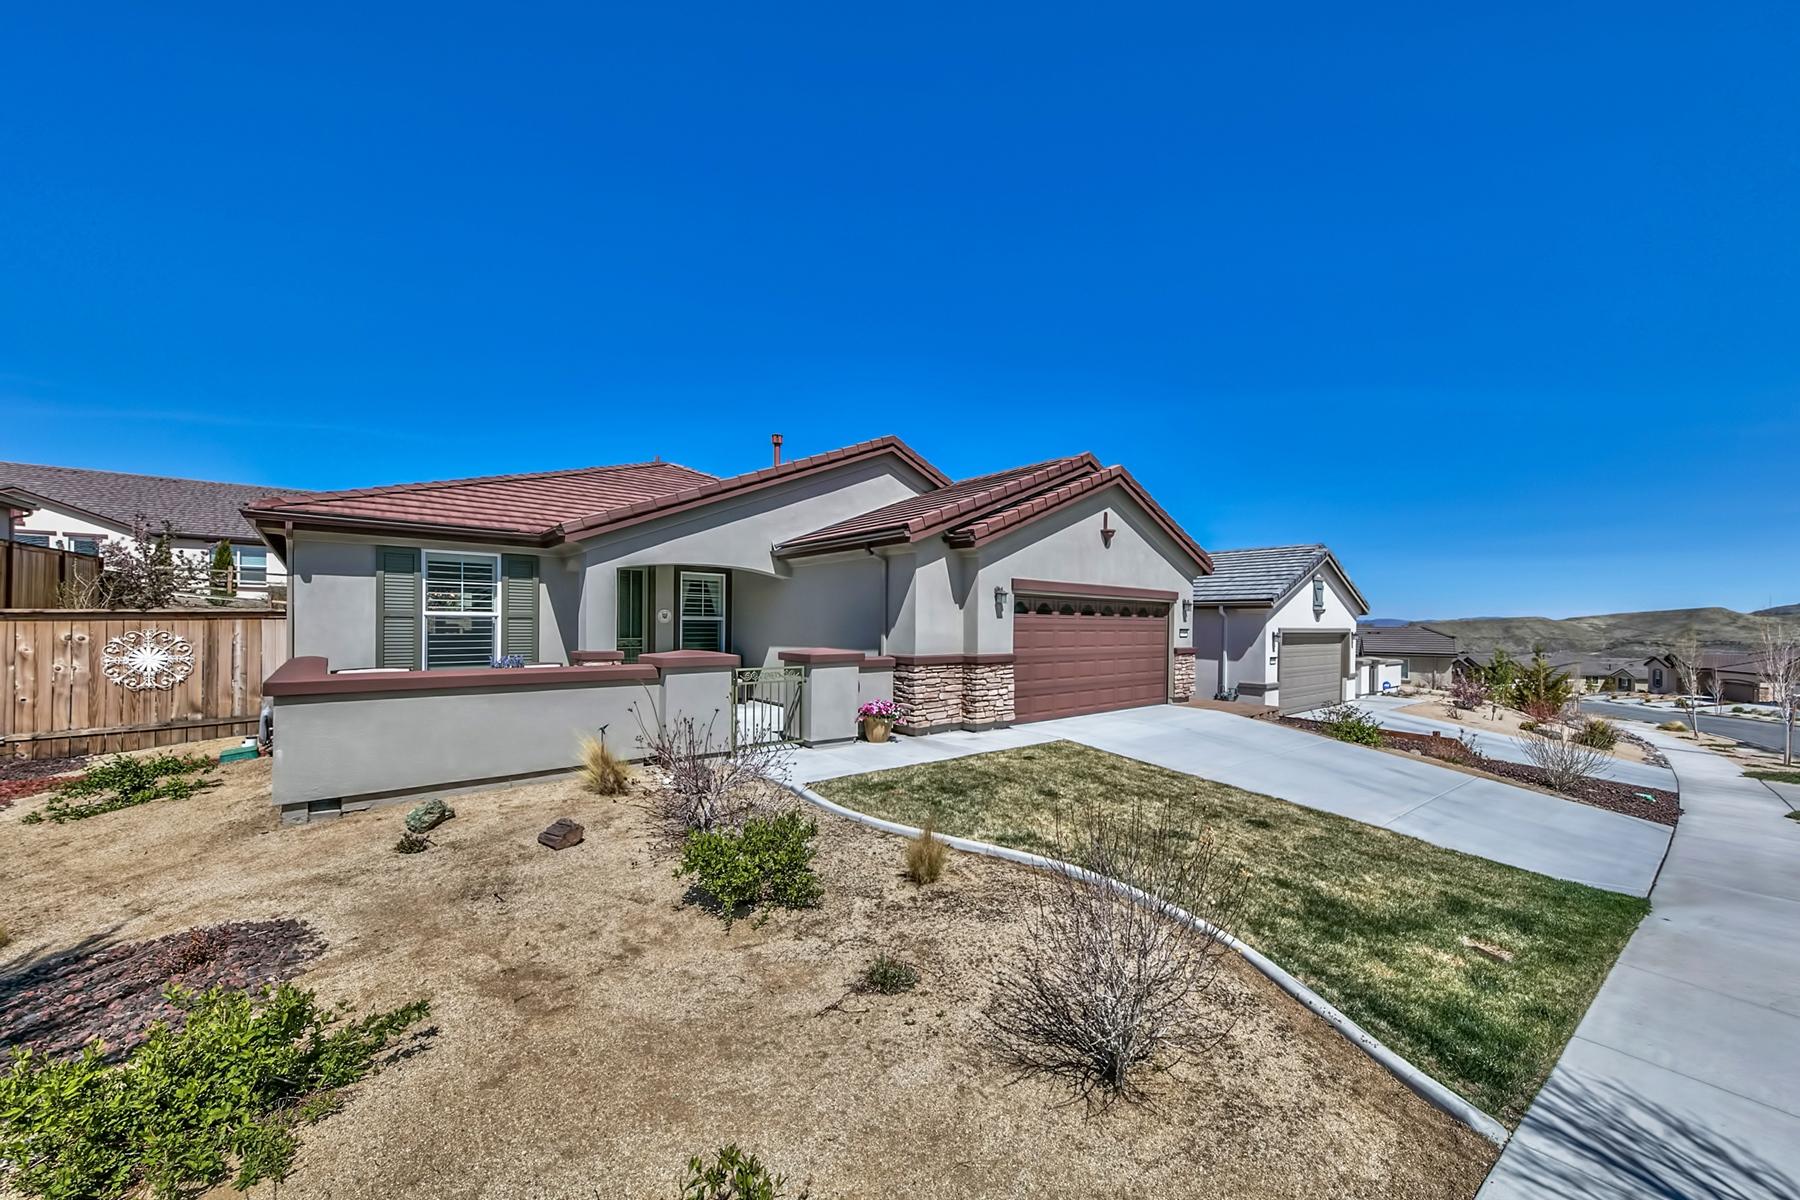 Single Family Home for Active at 1340 Wakefield Trail, Reno NV 89523 1340 Wakefield Reno, Nevada 89523 United States